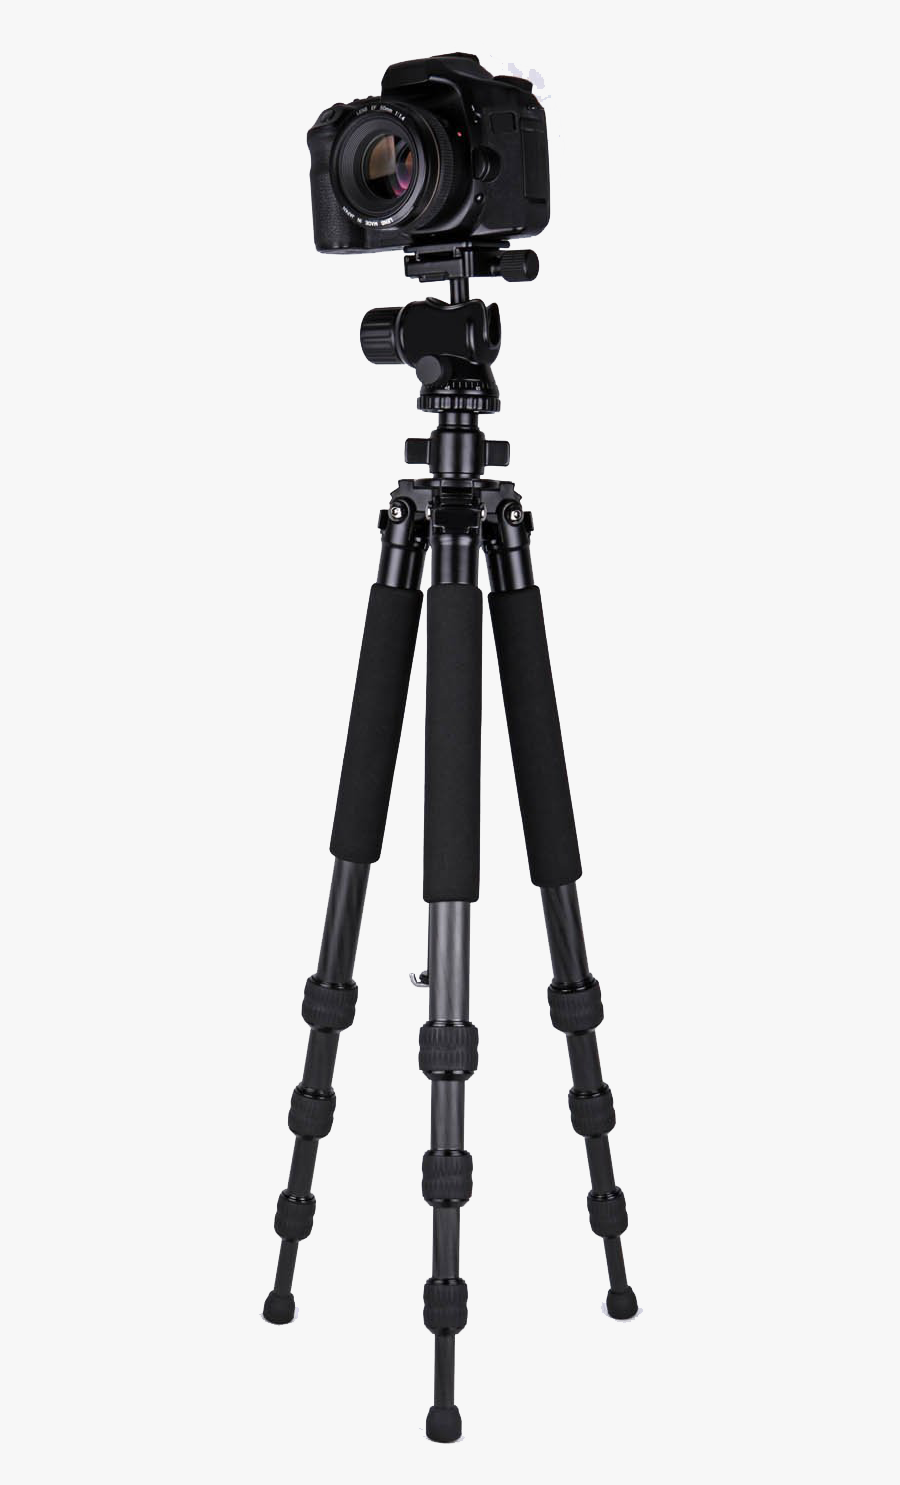 Video Camera Tripod Png Image - Camera On Tripod Png ... (900 x 1485 Pixel)